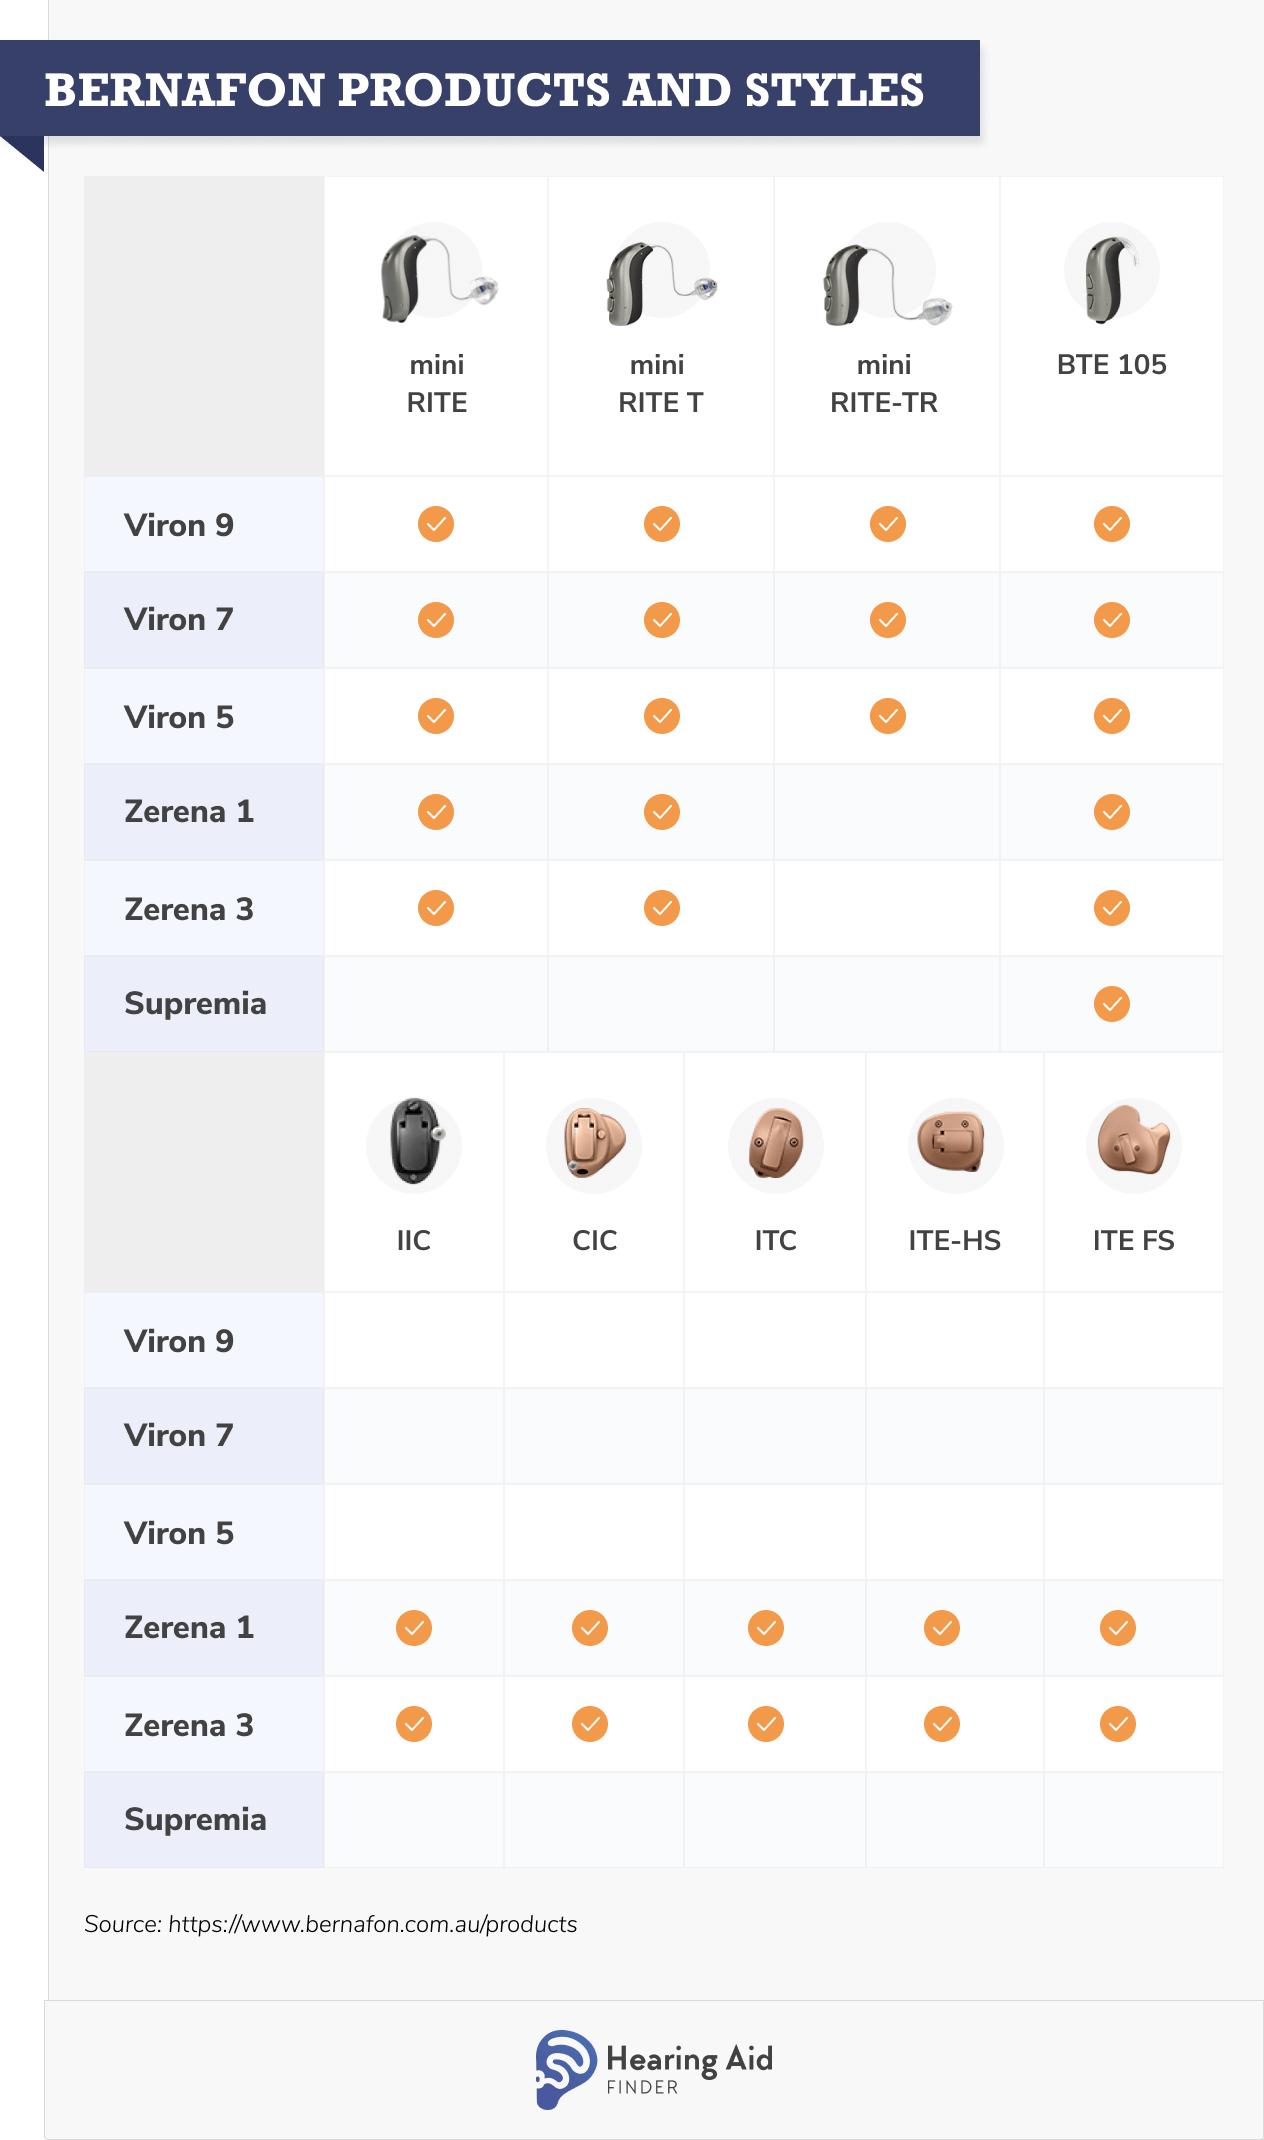 bernafon products and styles